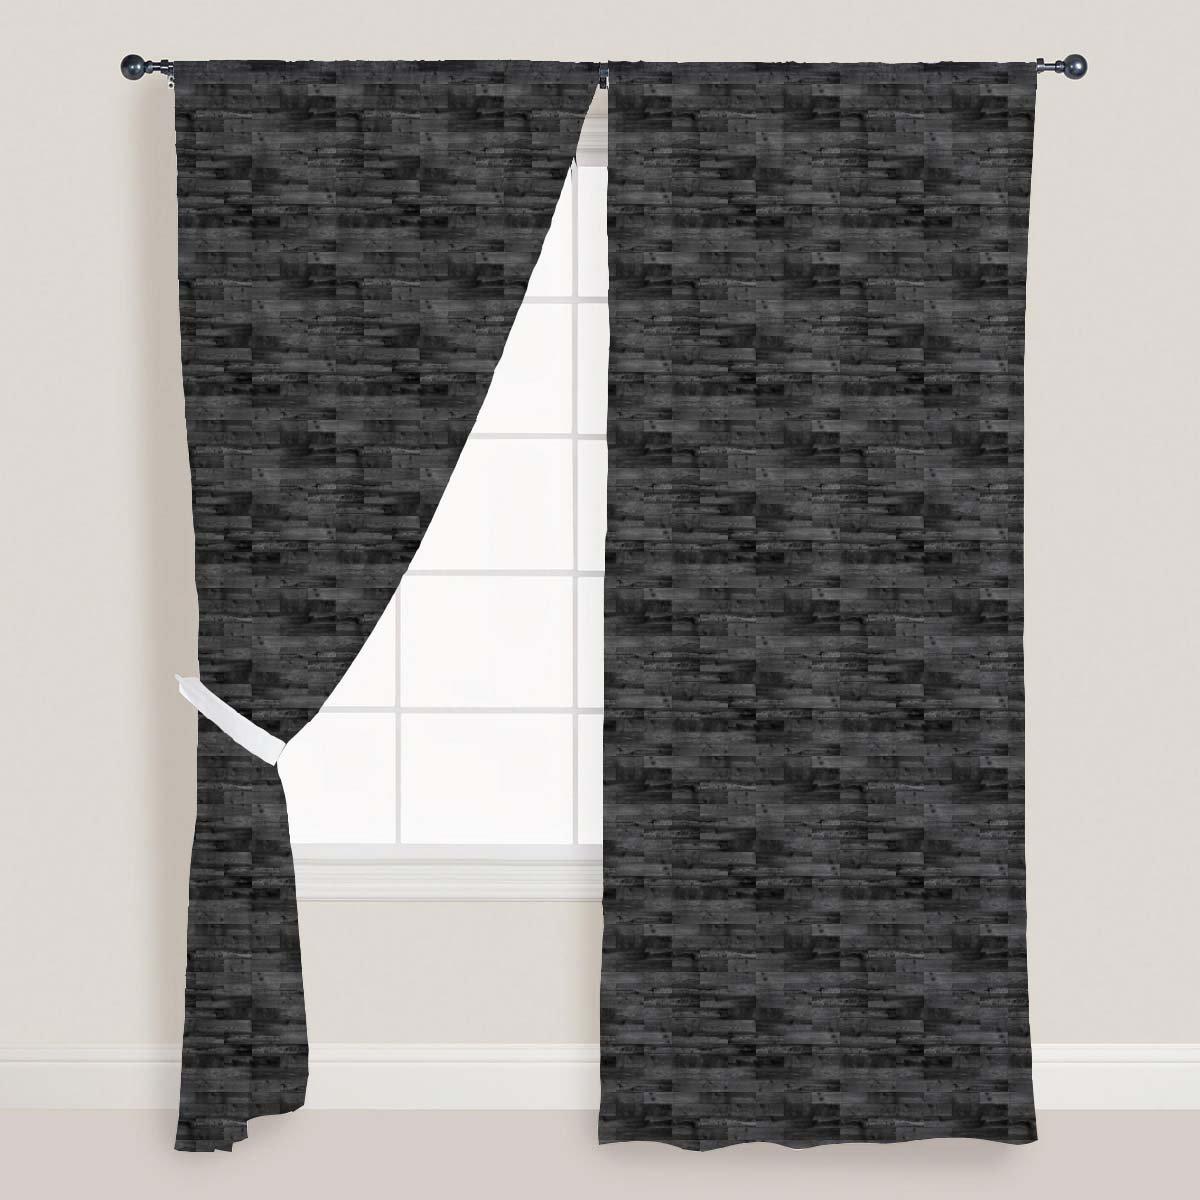 saludable ArtzFolio AZ Dark Dark Dark Parquet Door  Window Curtain Satin 4feet x 11feet; Set of 2 PCS  punto de venta en línea